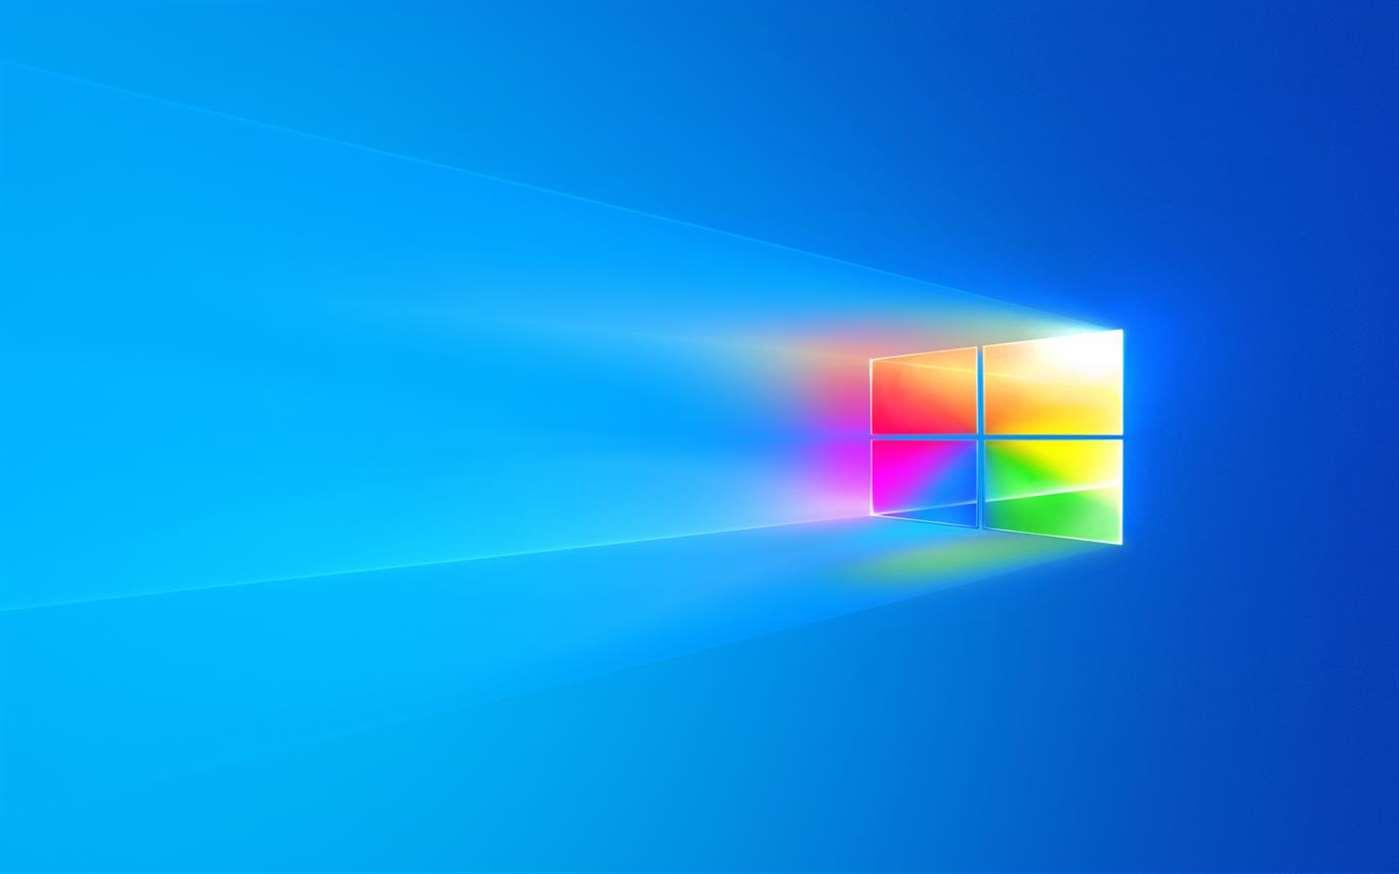 Download Microsoft Wallpaper Hd Backgrounds Download Itl Cat